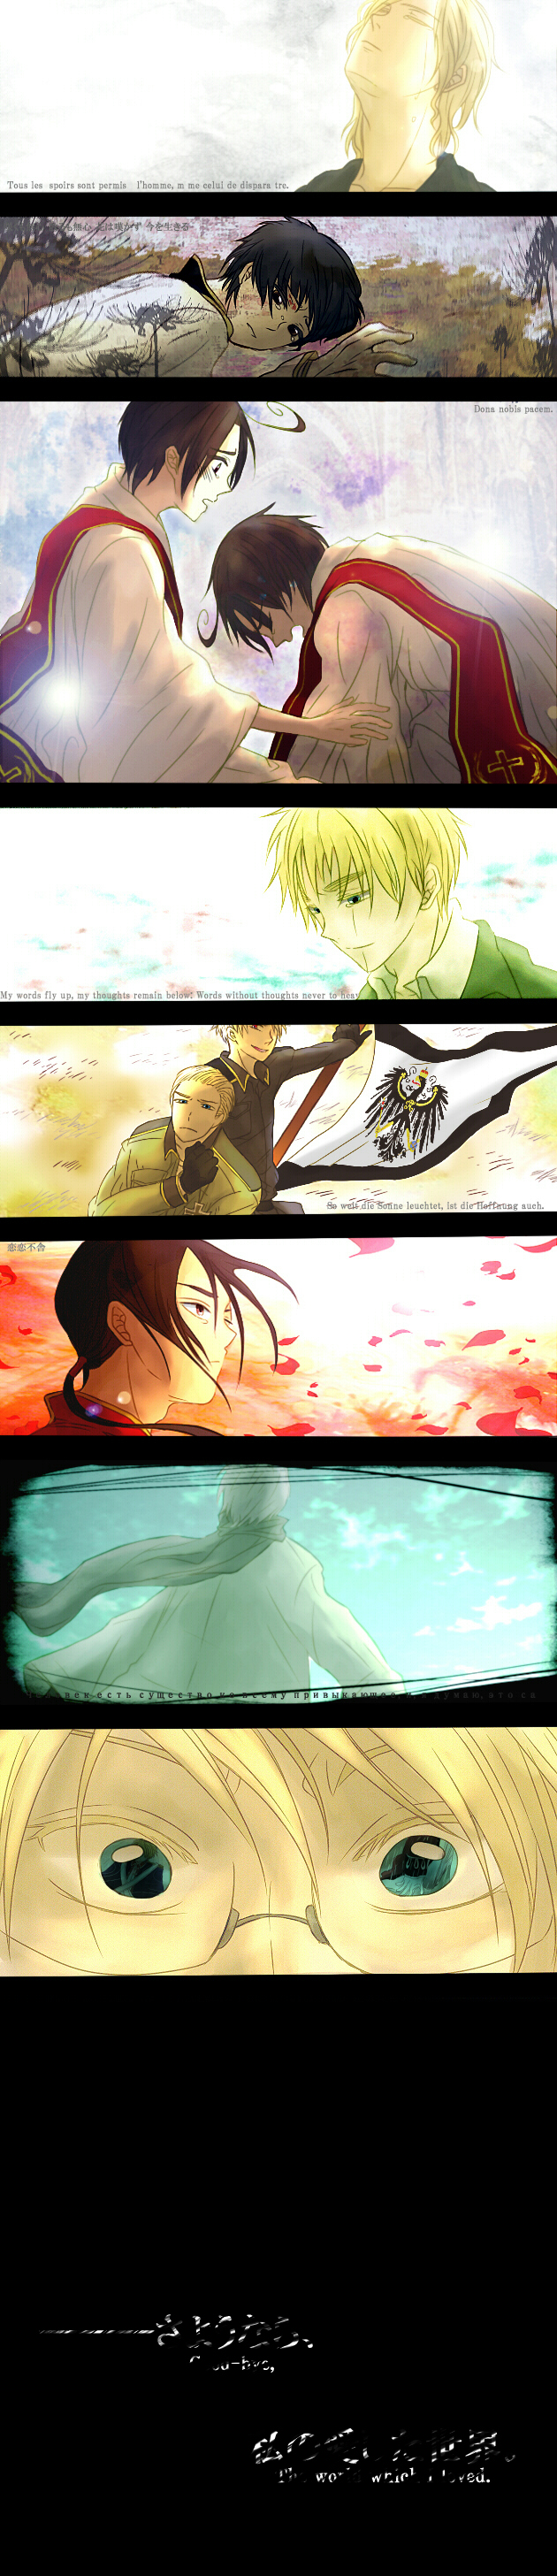 Tags: Anime, Axis Powers: Hetalia, Romaheta, United Kingdom, China, United States, France, Germany, Japan, Russia, Prussia, Fanart, American Revolutionary War